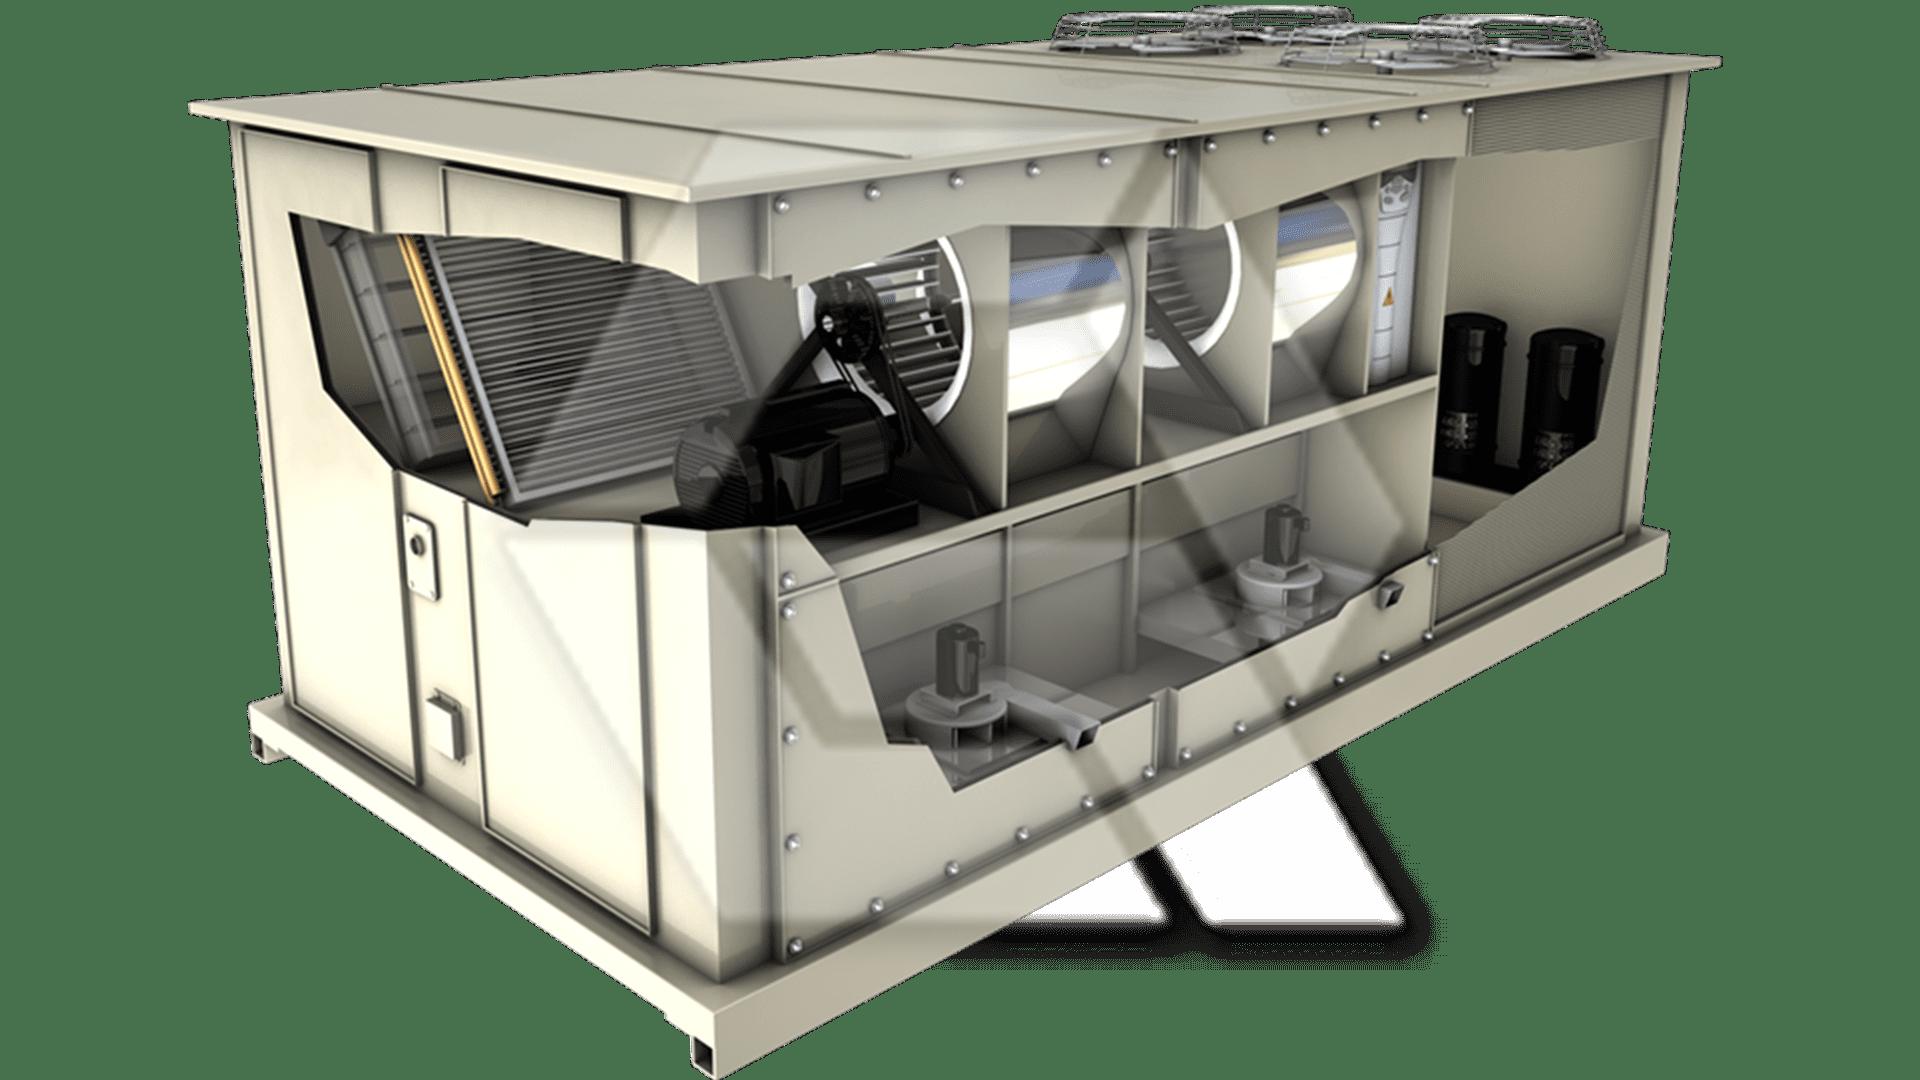 Carrier RTU Open View